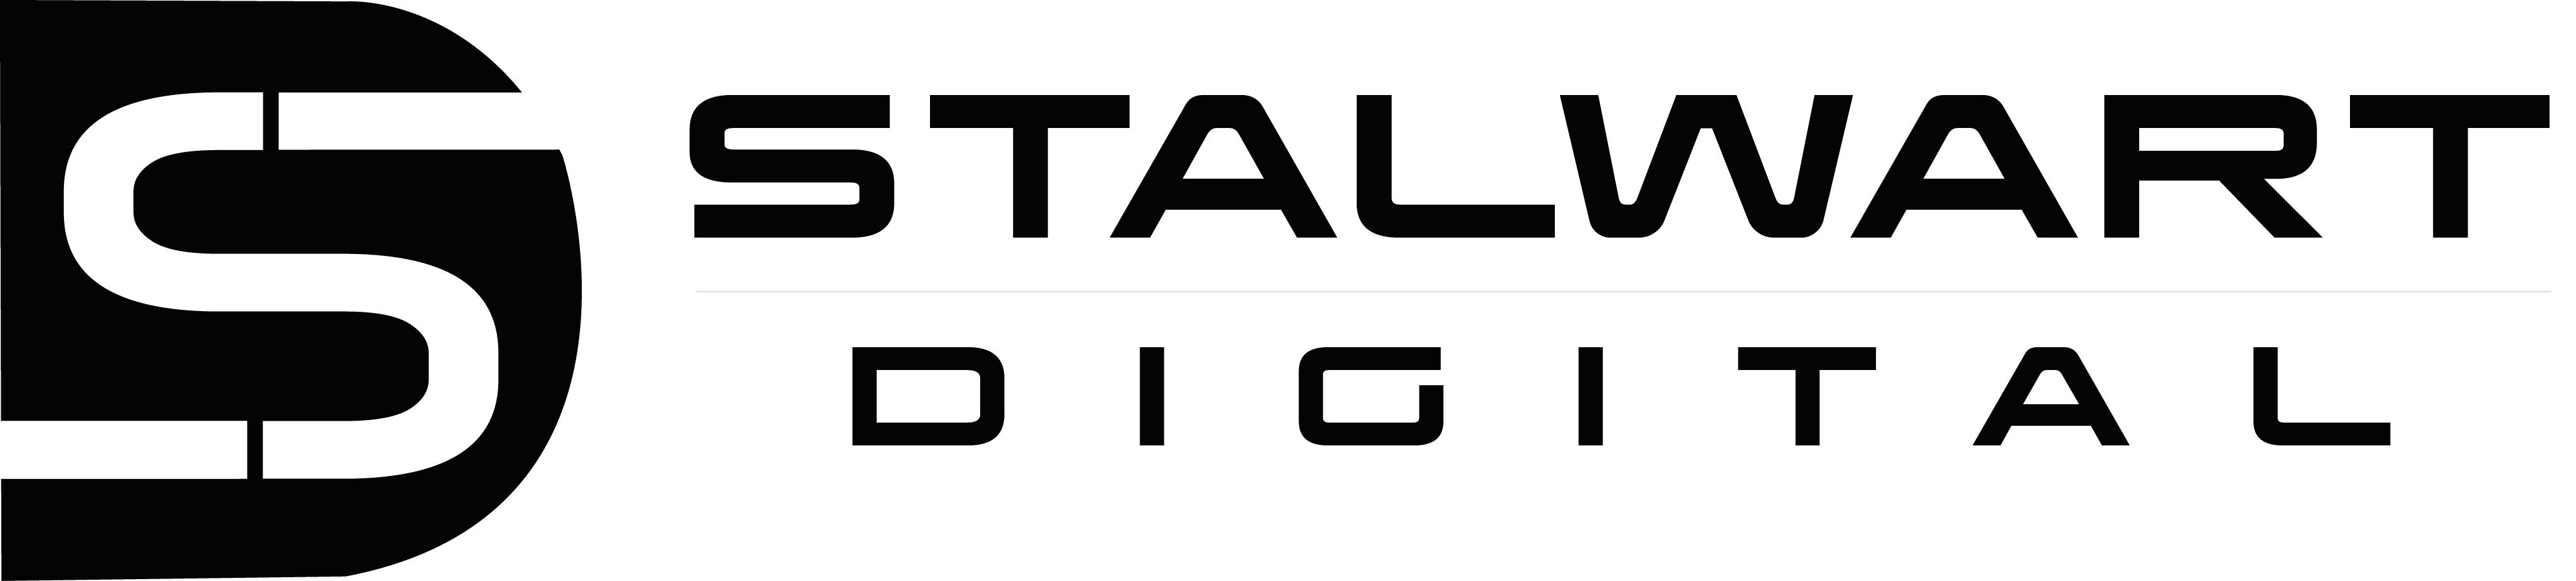 STALWART DIGITAL